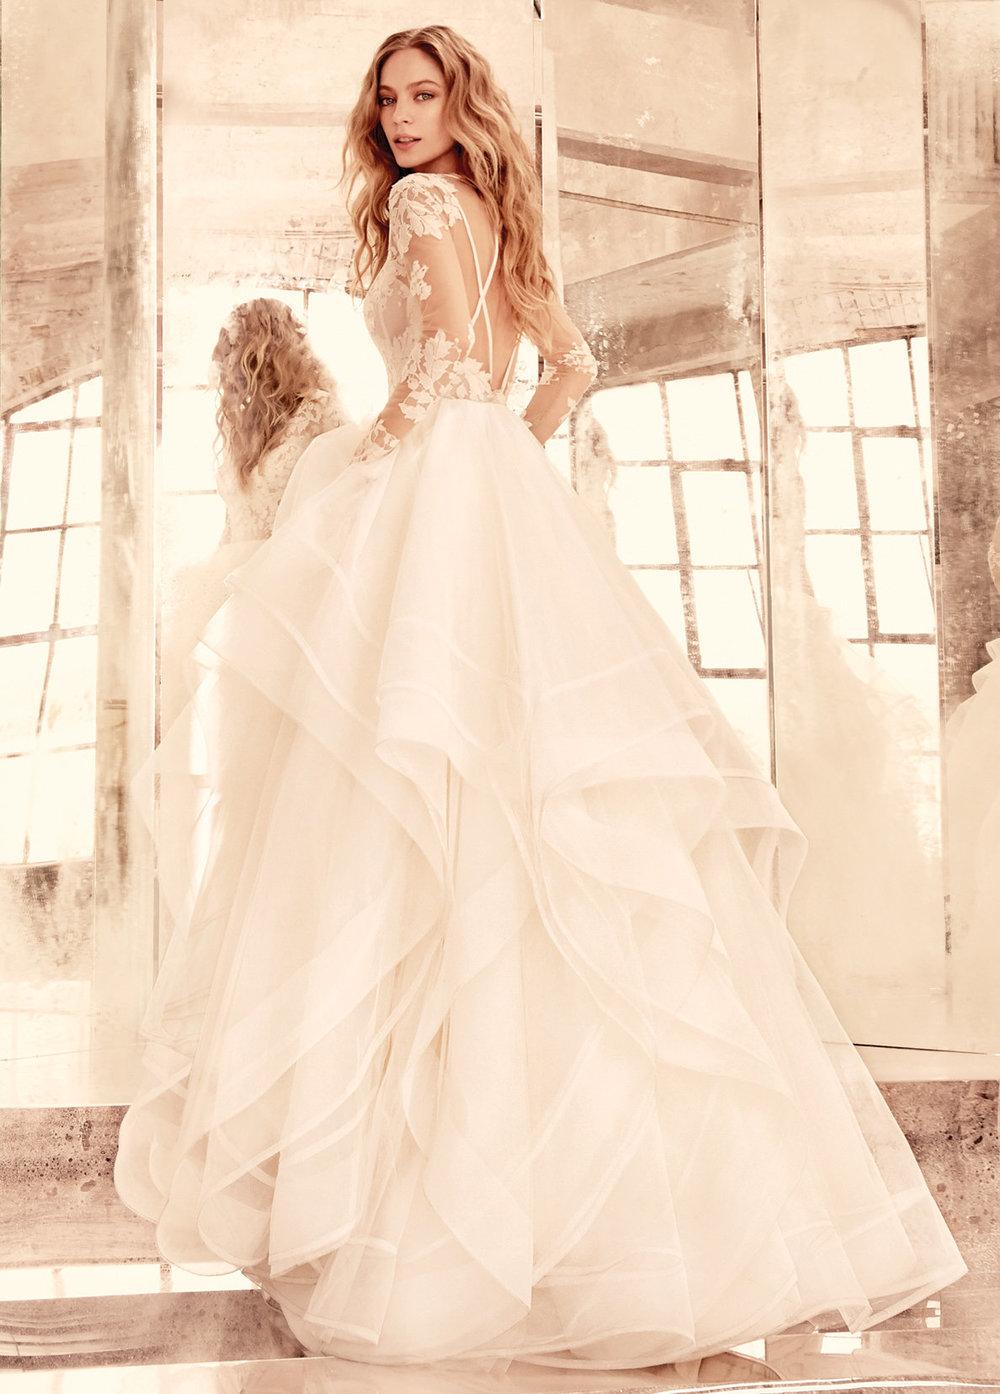 MGC-Website-HayleyPaigeBridal-Elysia-Back.jpg